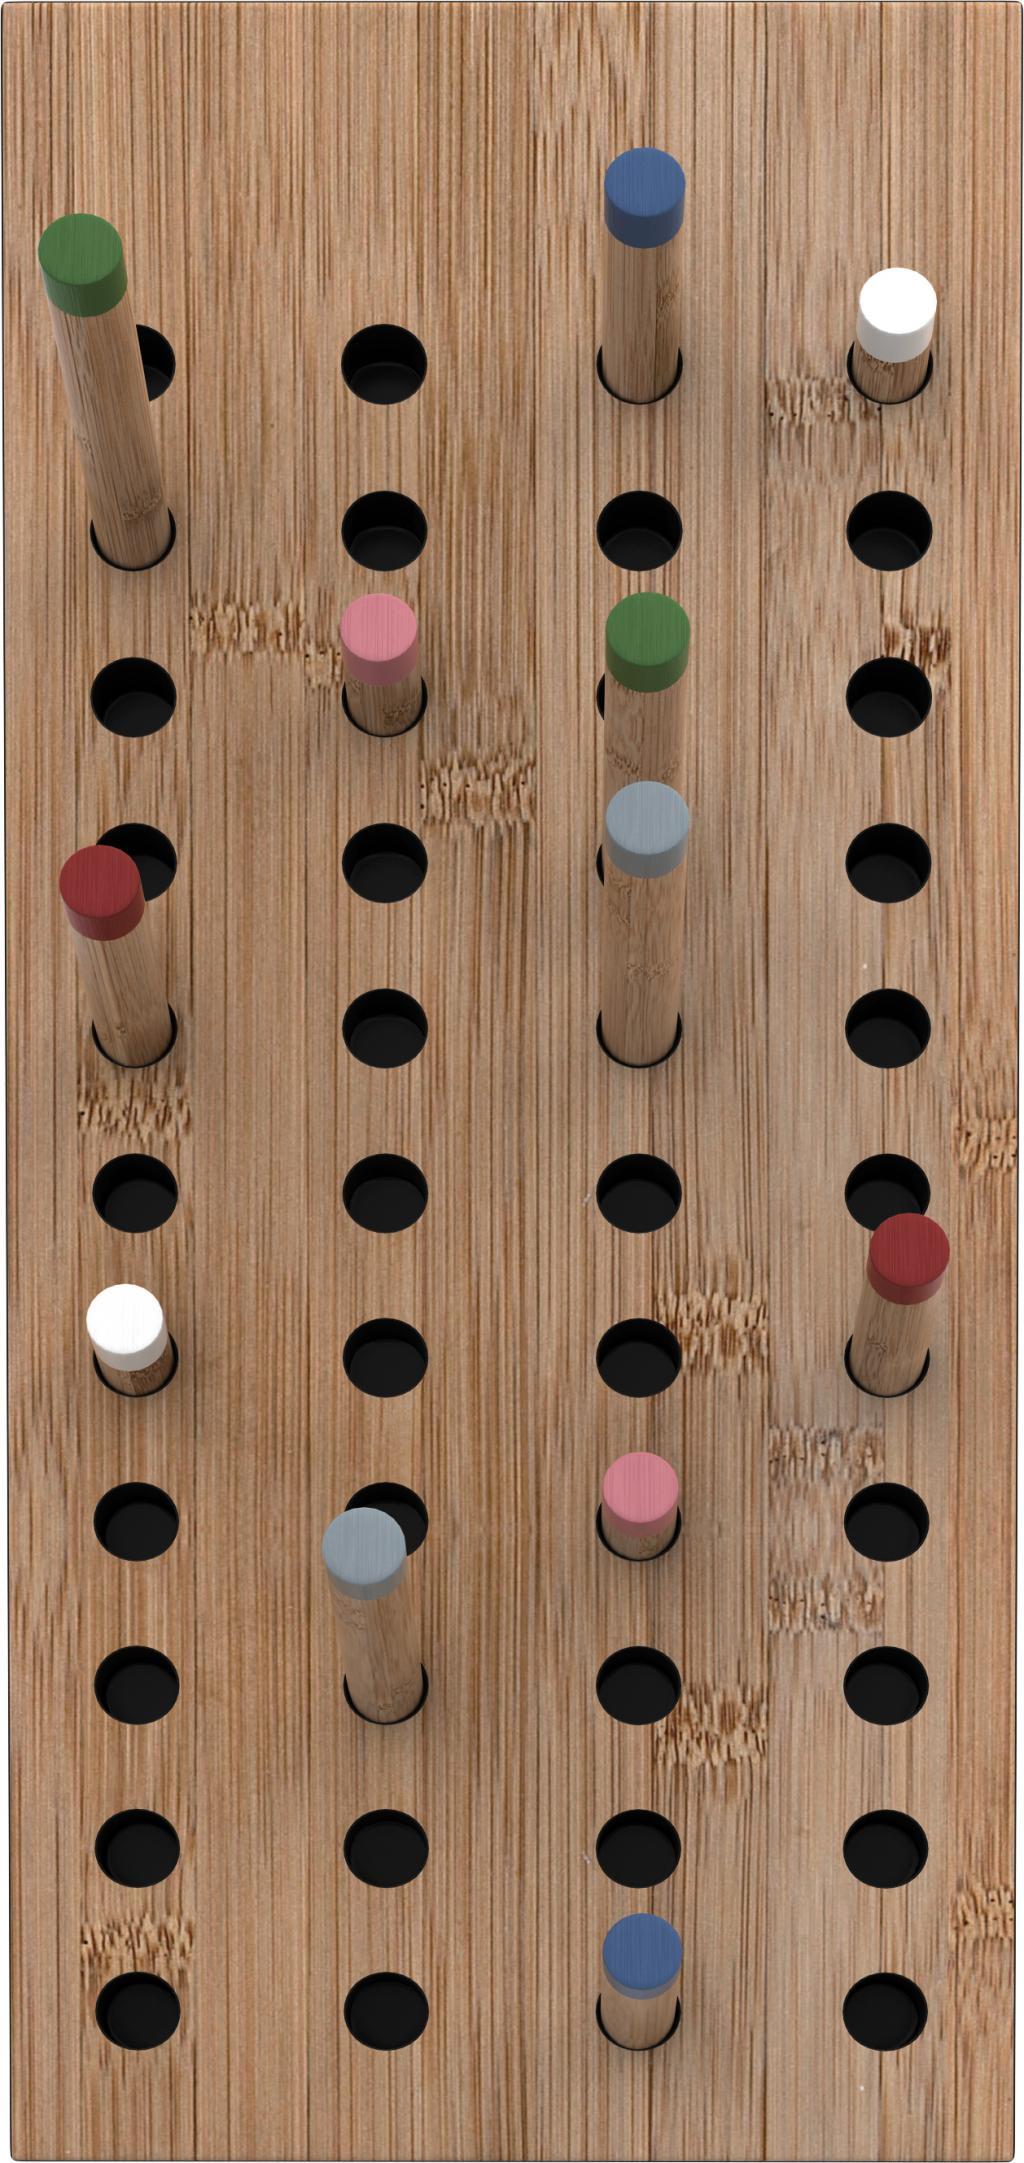 kapstok scoreboard small we do wood. Black Bedroom Furniture Sets. Home Design Ideas